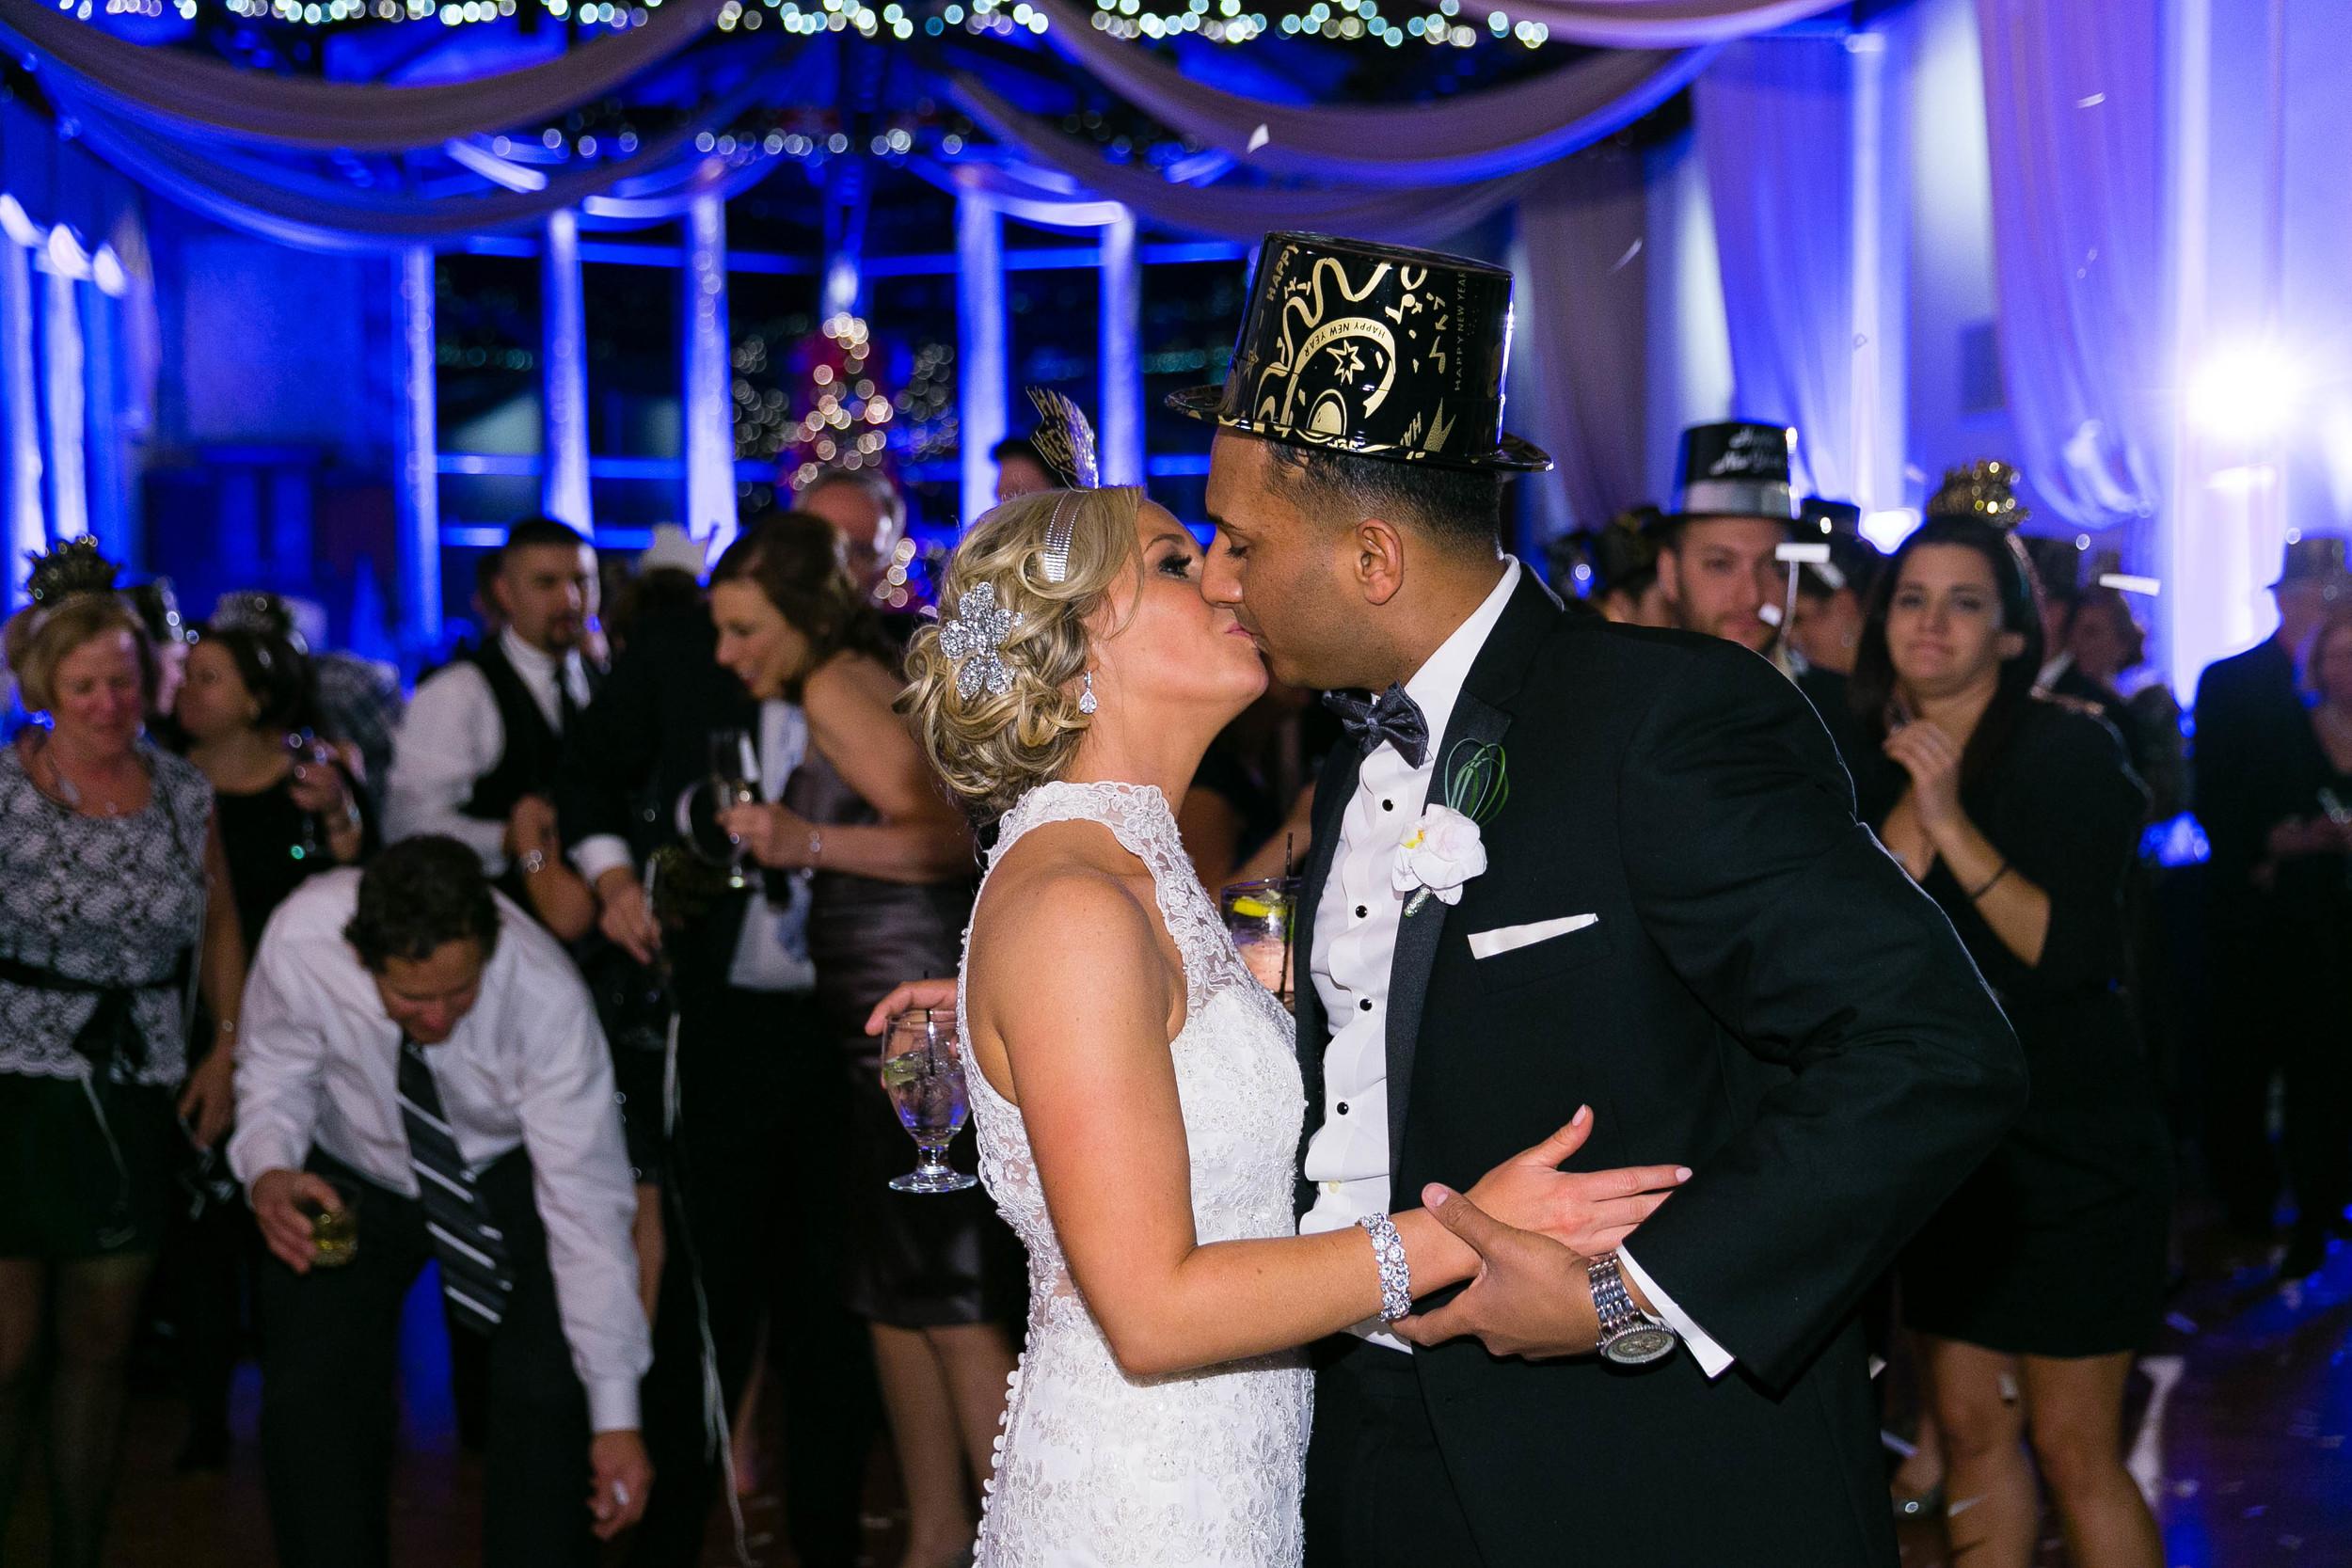 New-Years-Eve-Pond-House-Cafe-West-Hartford-Connecticut-Wedding-Jacek-Dolata-Photography-13.jpg